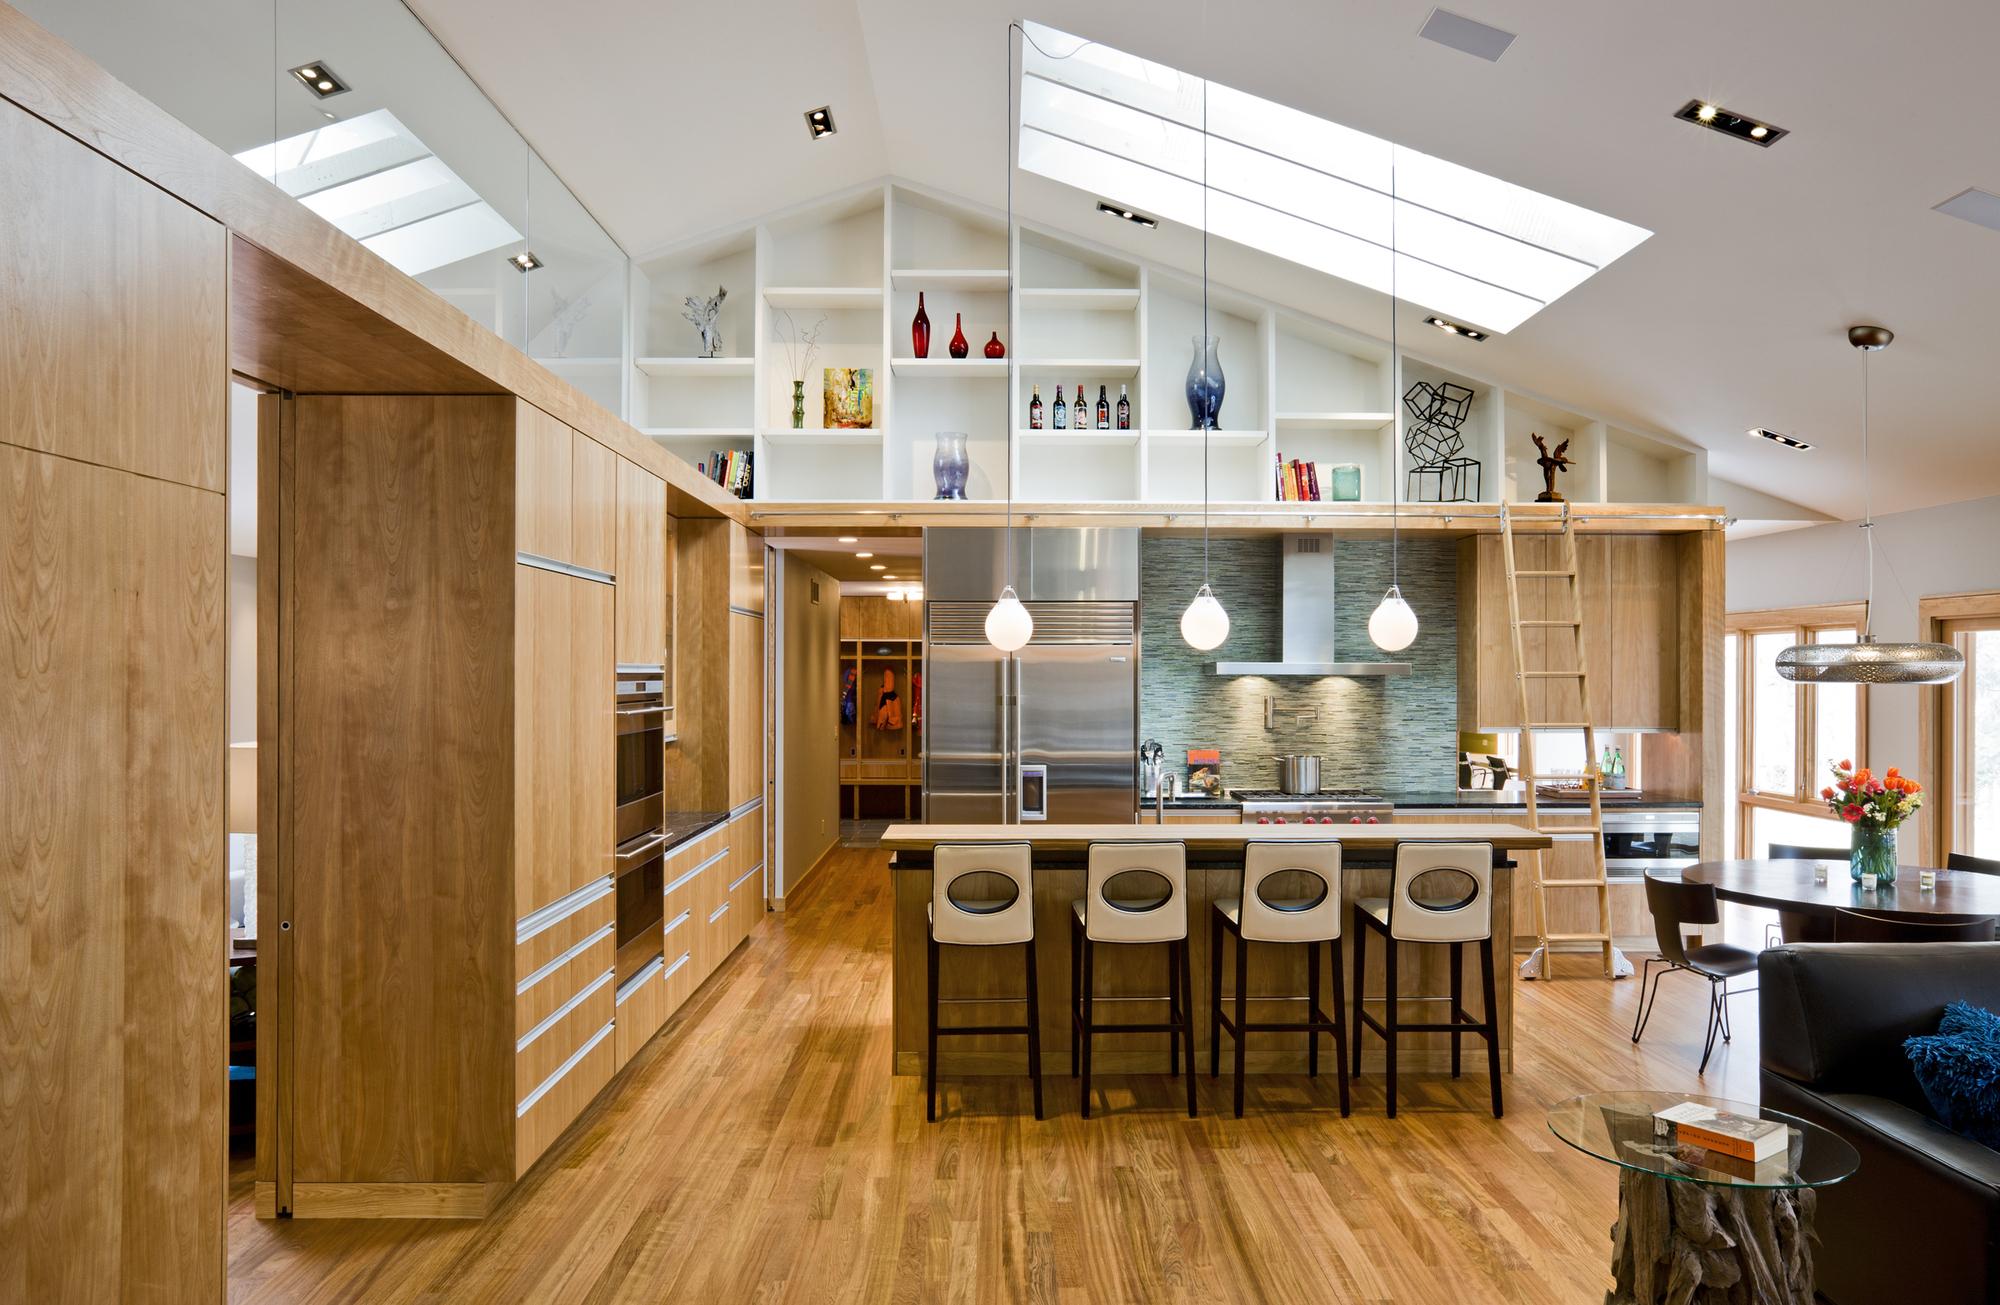 bi level house plans remodel split level kitchen remodel Split Level House Interior Zco Kitchen Remodel